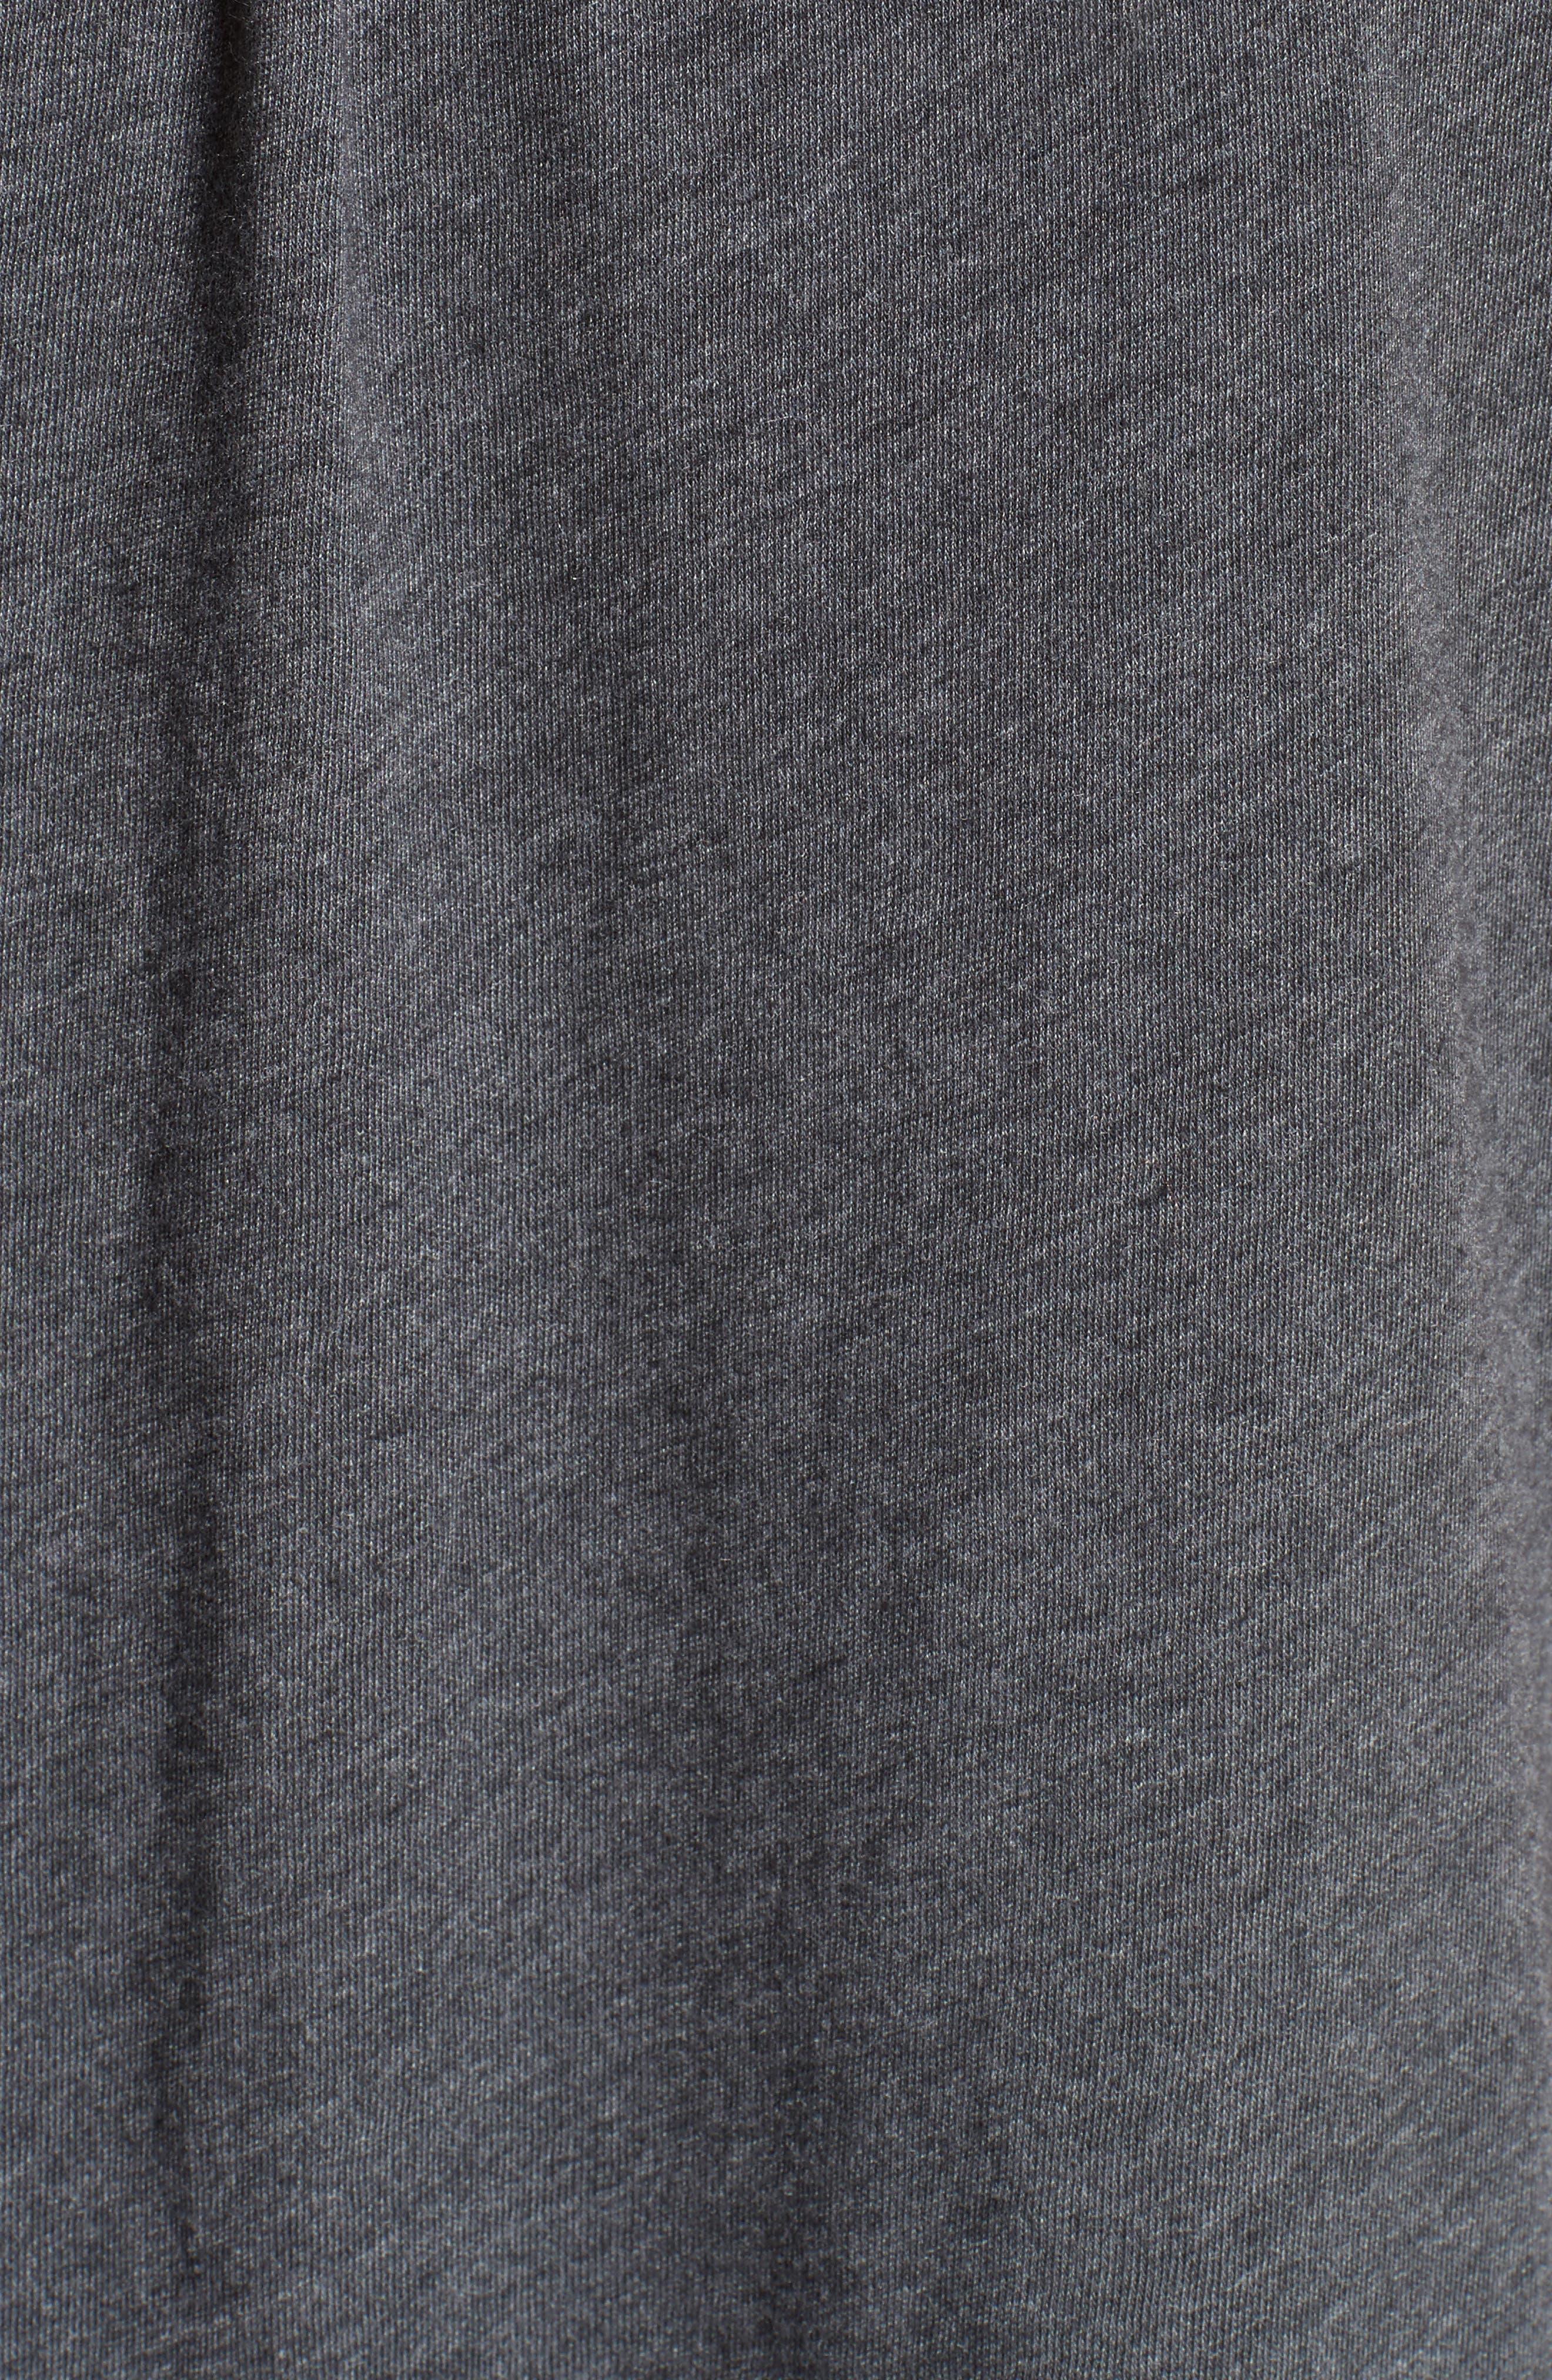 Carley Split Neck Top,                             Alternate thumbnail 5, color,                             071